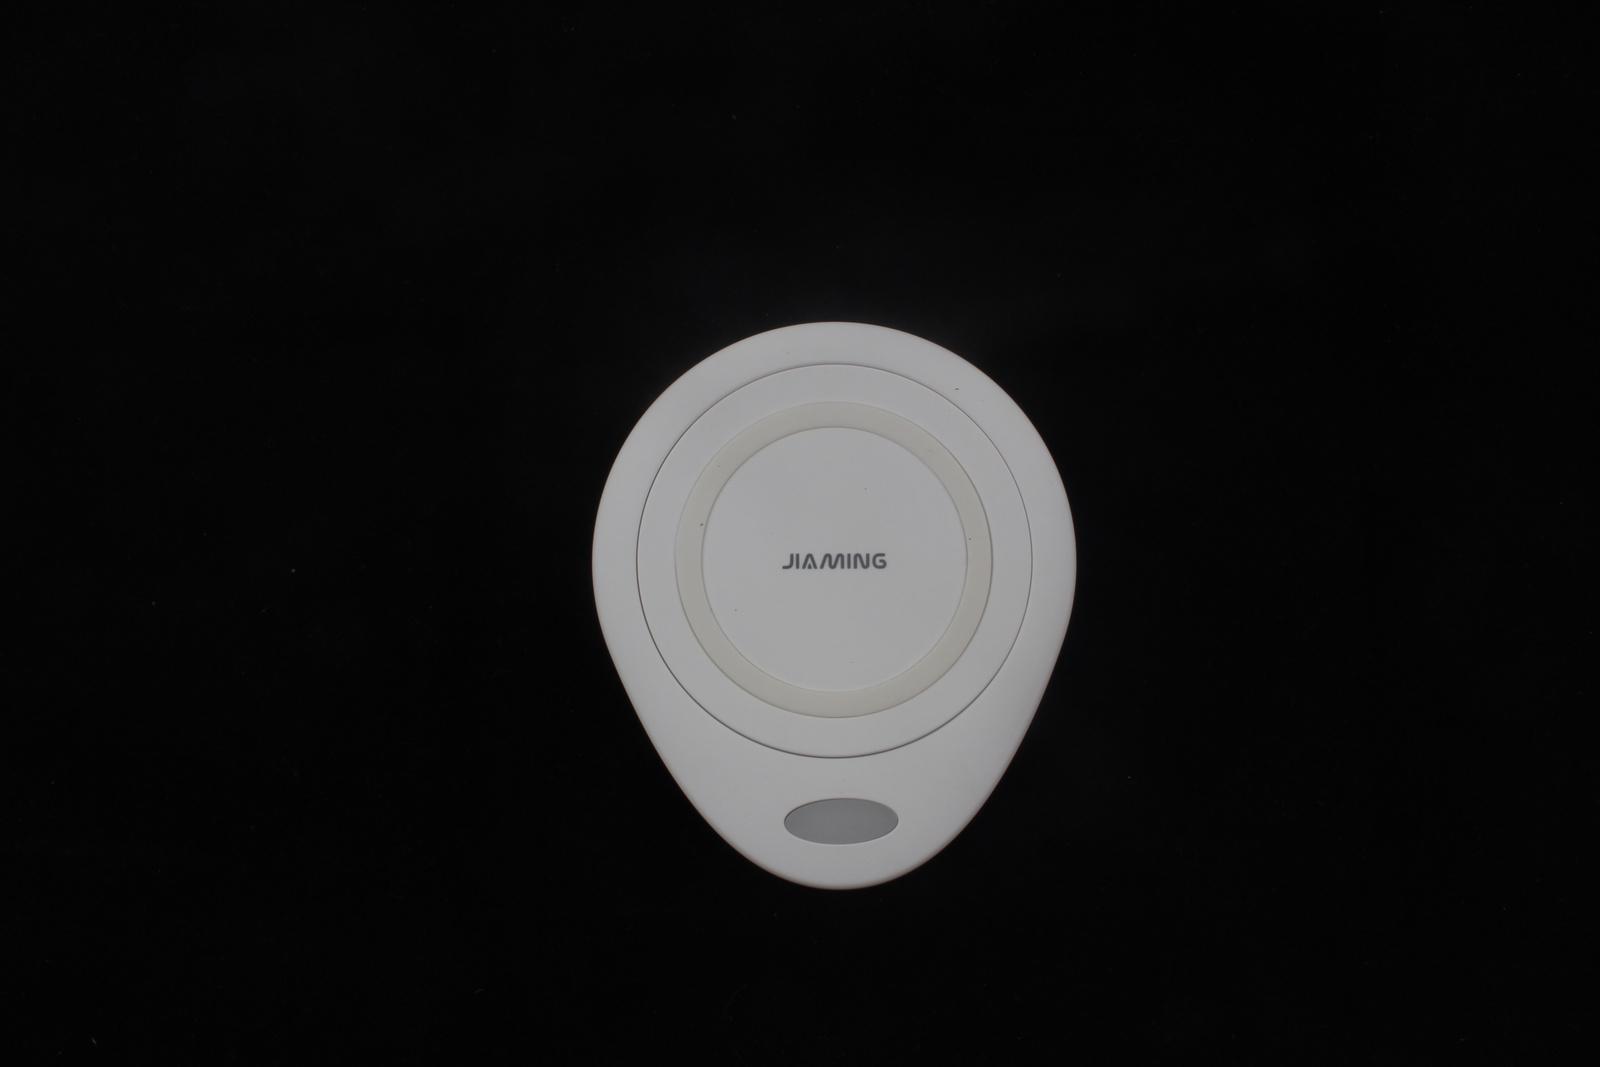 Беспроводное зарядное устройство JIA MING WX1, 4605180034195, белый четки yue ming